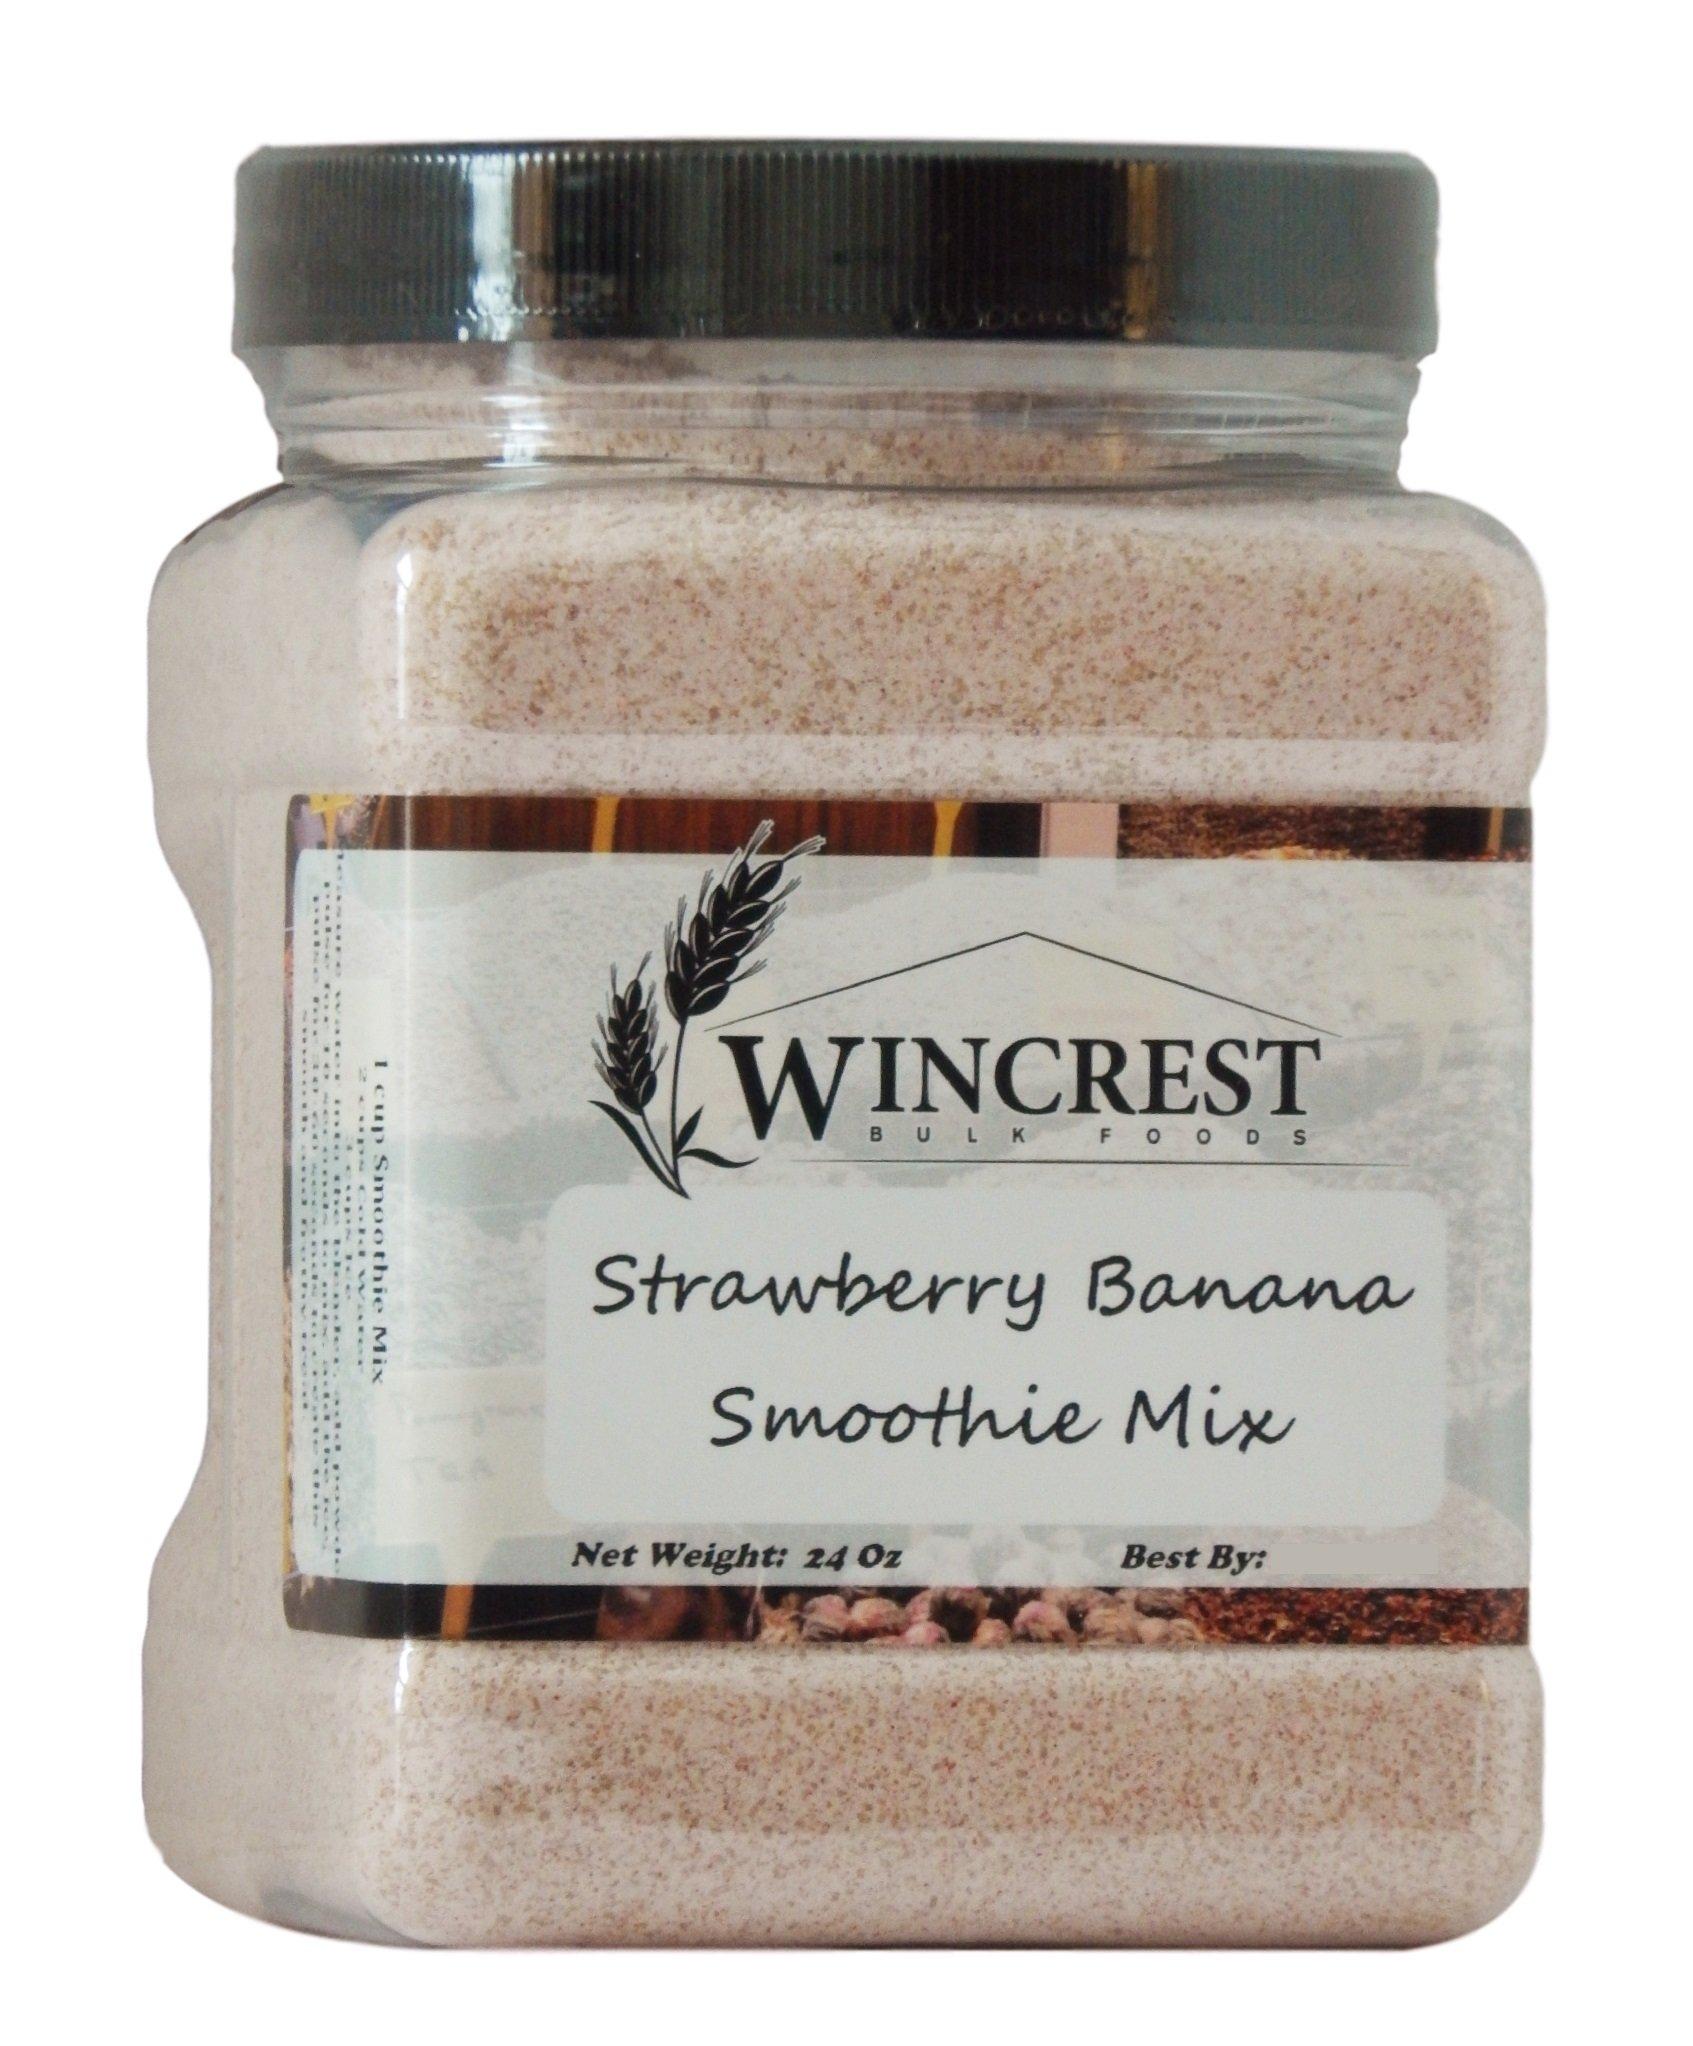 Instant Smoothie Mixes 15 Lb 24 Oz Tubs Ghirardelli Heels Bay Beige 36 Strawberry Banana Juice Drinks Grocery Gourmet Food